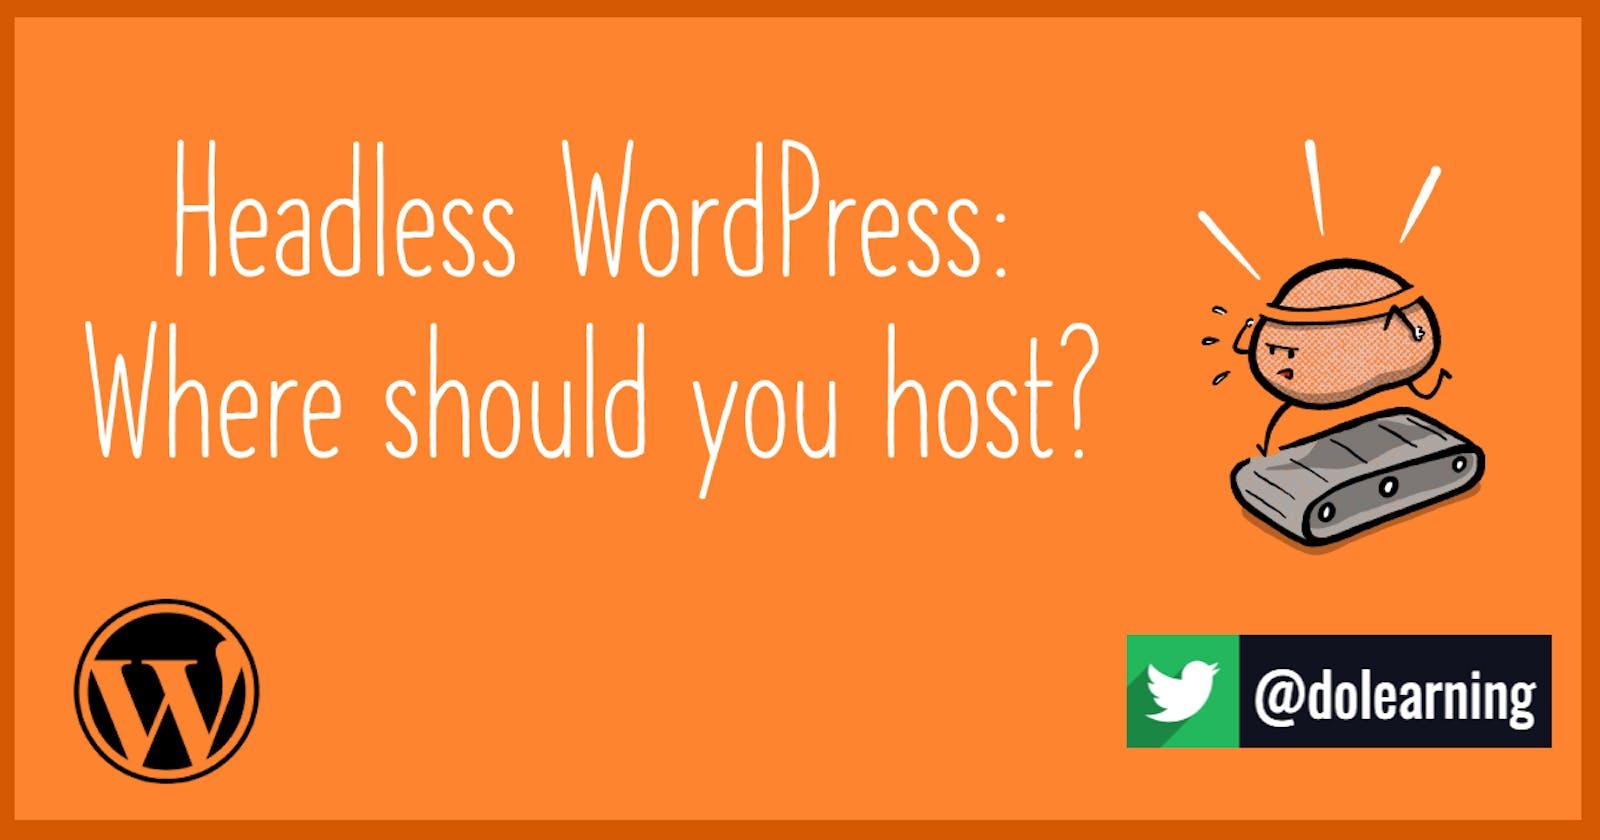 Headless WordPress: Where should you host the WordPress instance?